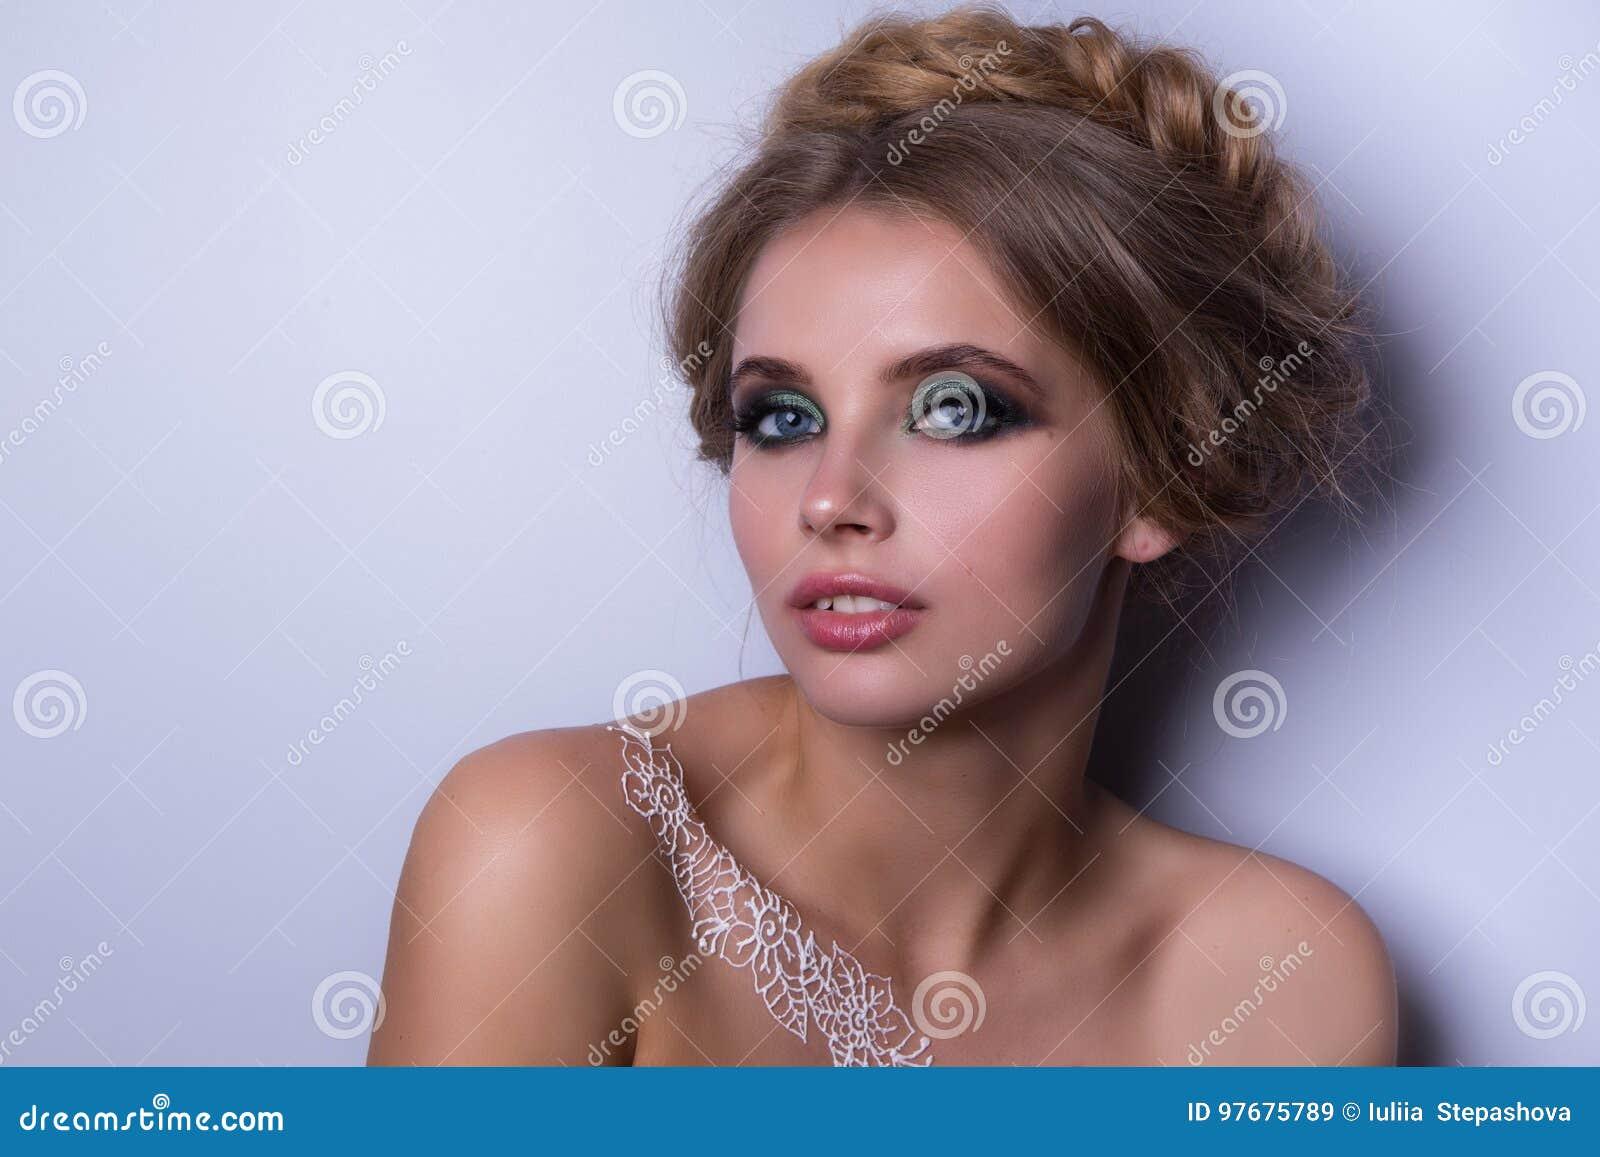 Beauty Fashion Model Woman Portrait Hairstyle With Braids Mehndi